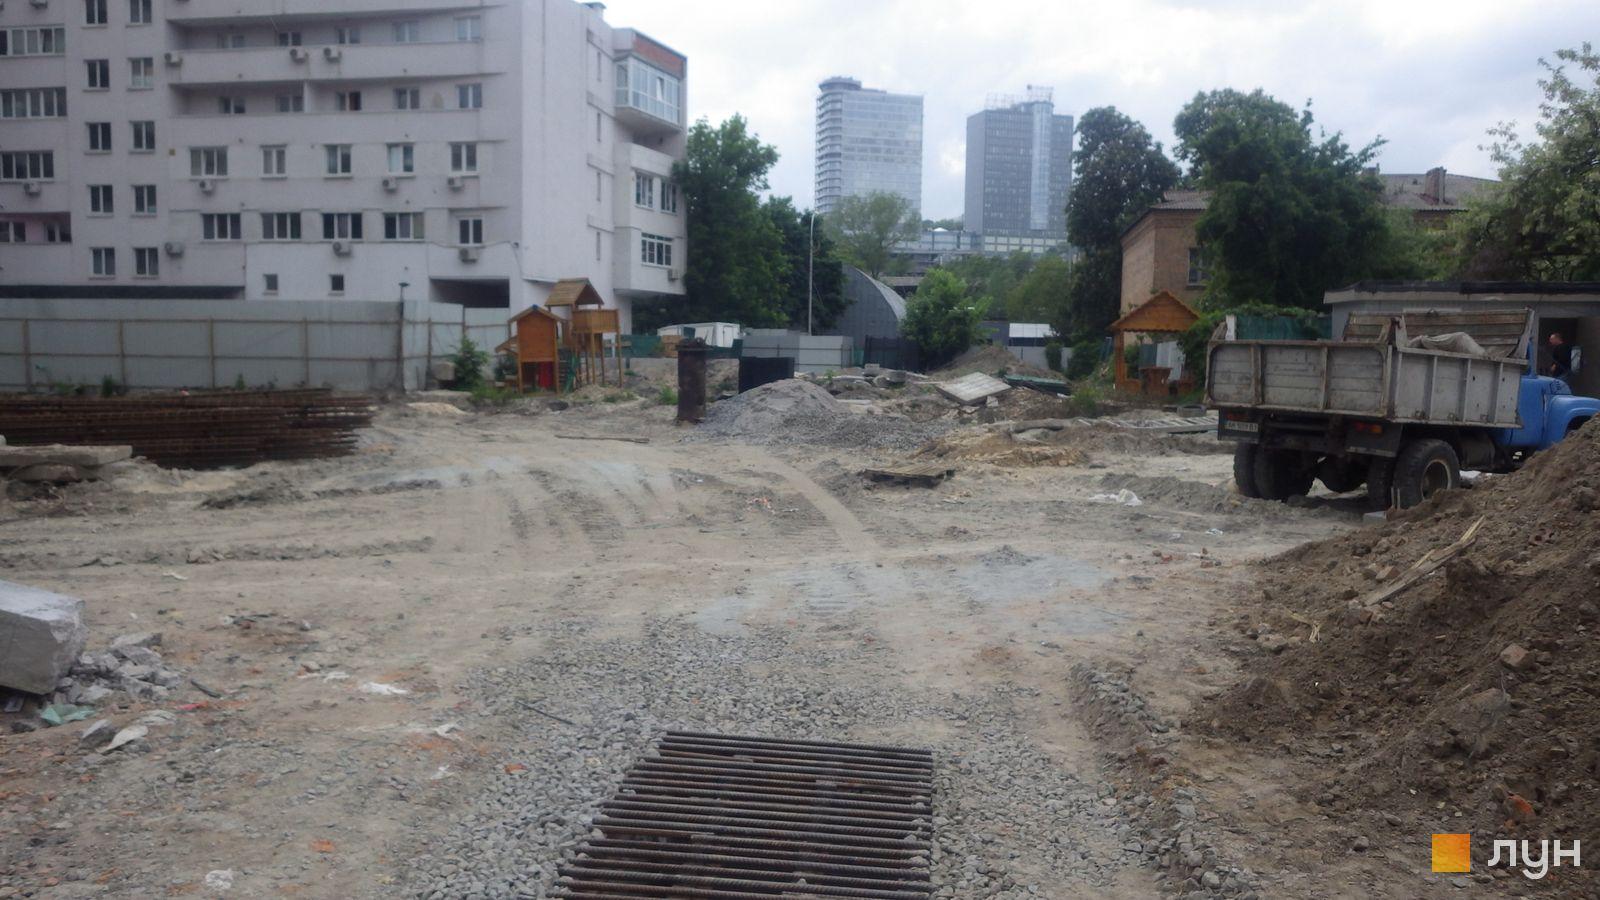 Ход строительства ул. Казимира Малевича, 44, 46, , май 2019